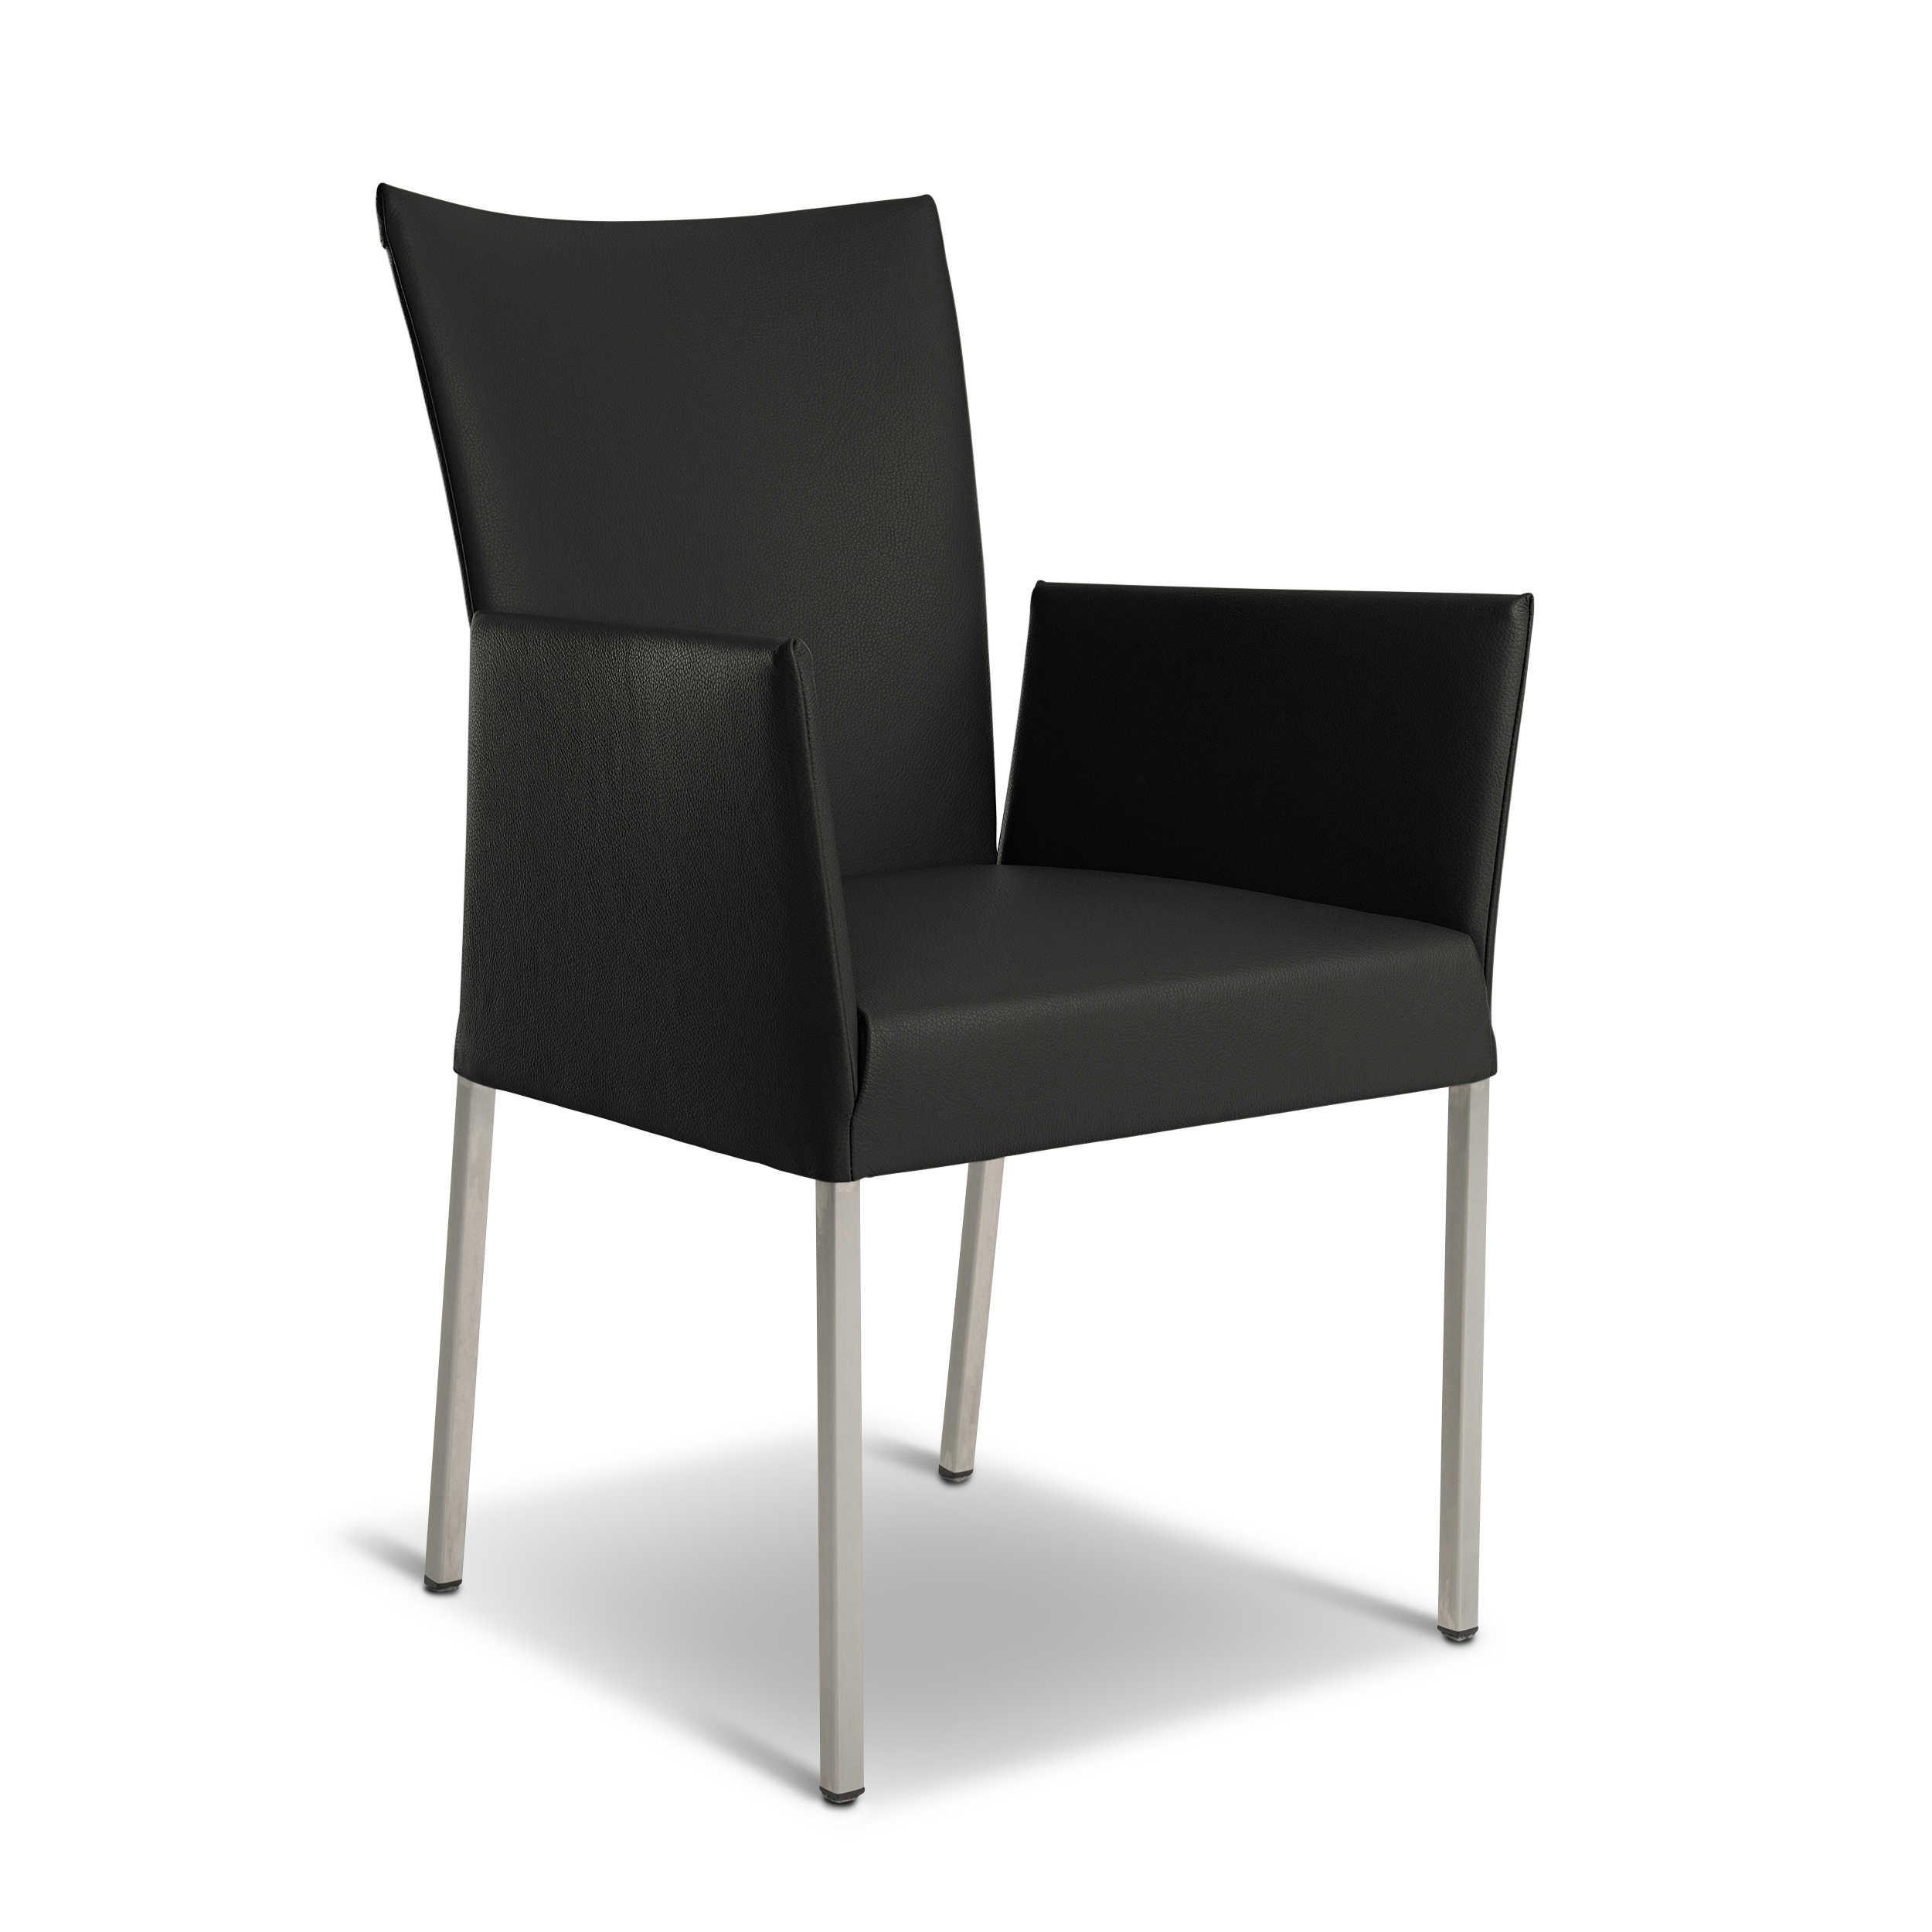 bert plantagie stuhl felp 2er set schwarz leder online kaufen bei woonio. Black Bedroom Furniture Sets. Home Design Ideas